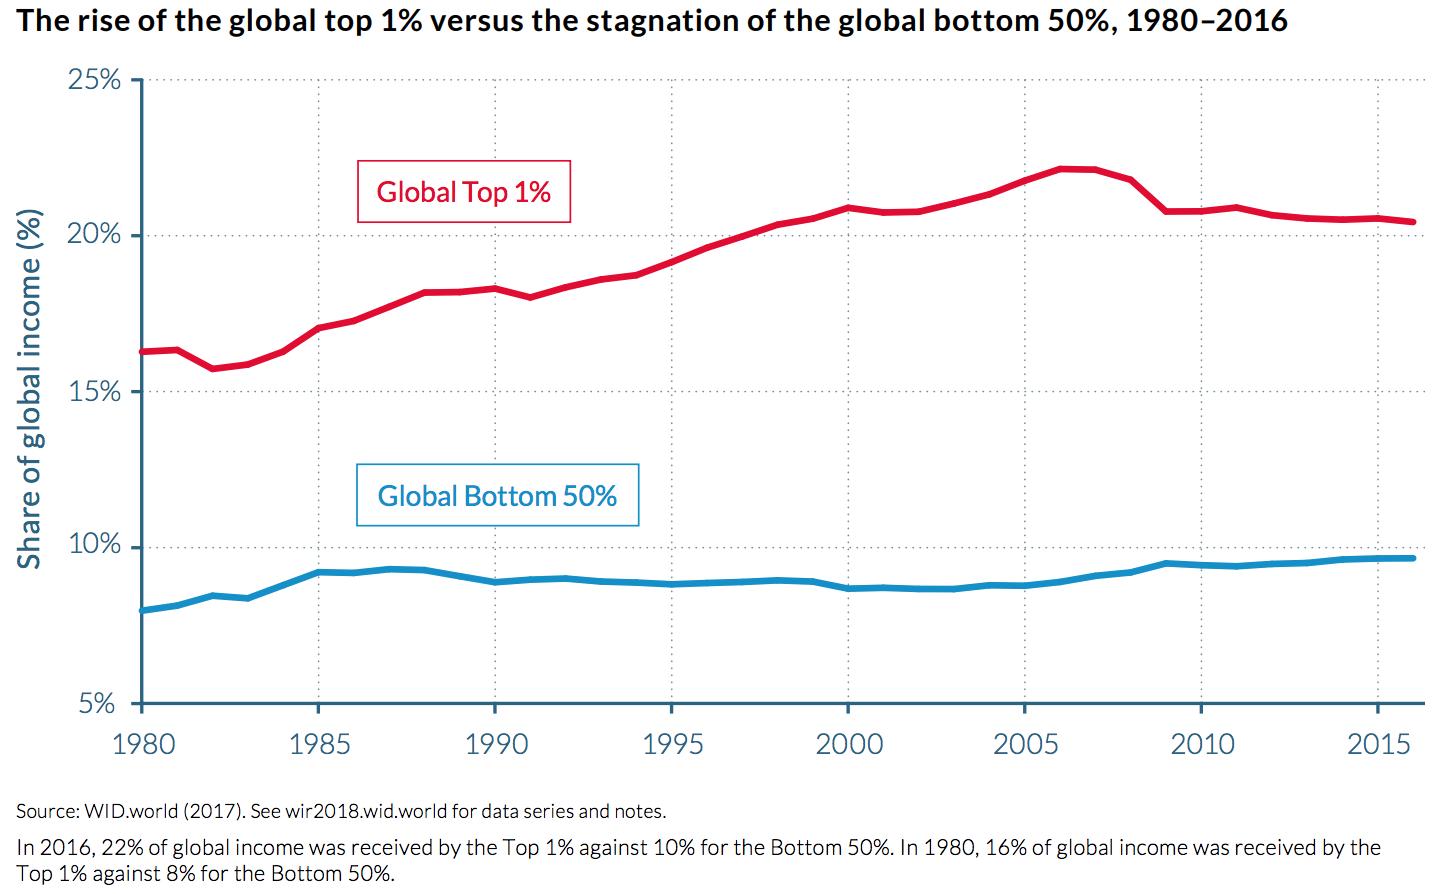 World - Inequality, WID 2017